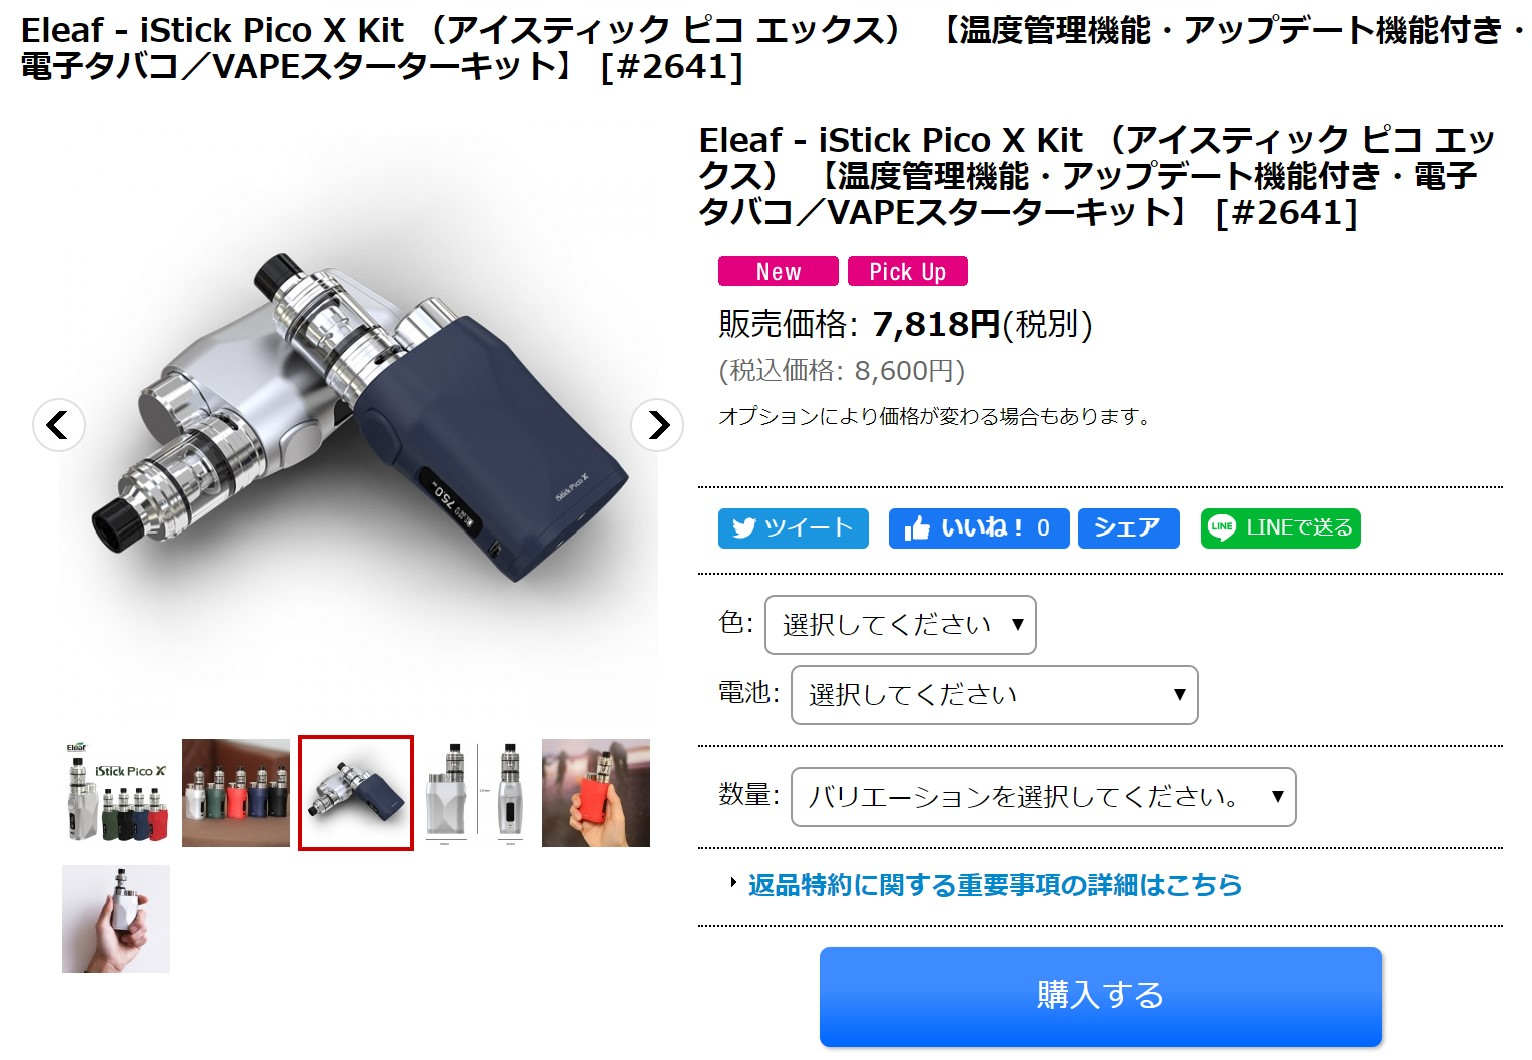 iStick Pico Xの公式サイトで買うと少し割高